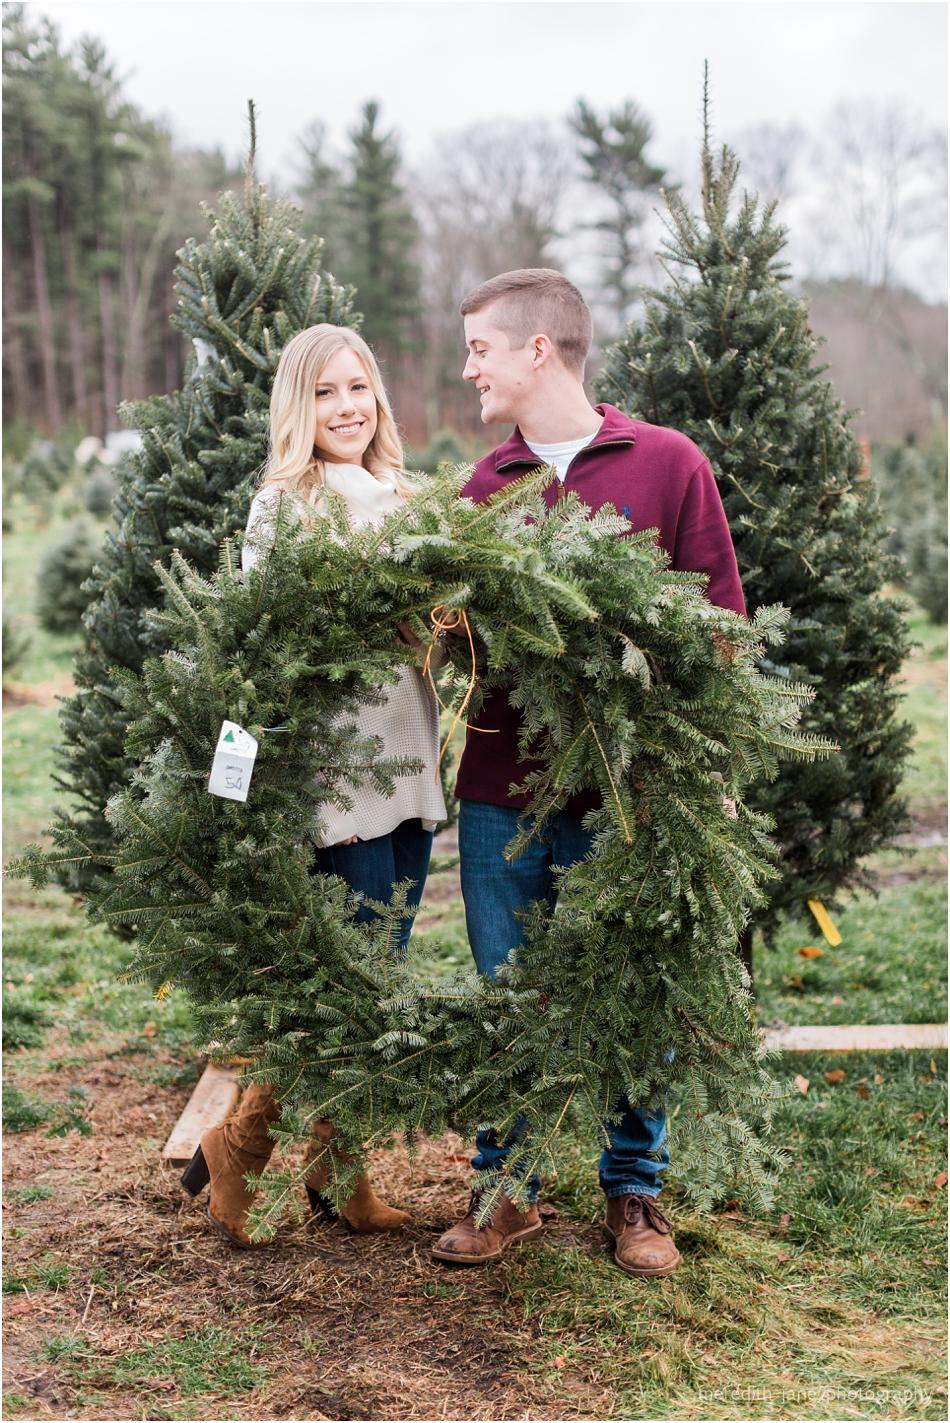 mistletoe_holiday_tree_farm_christmas_boston_massachusetts_engagement_fall_cape_cod_wedding_photographer_Meredith_Jane_Photography_photo_1005.jpg